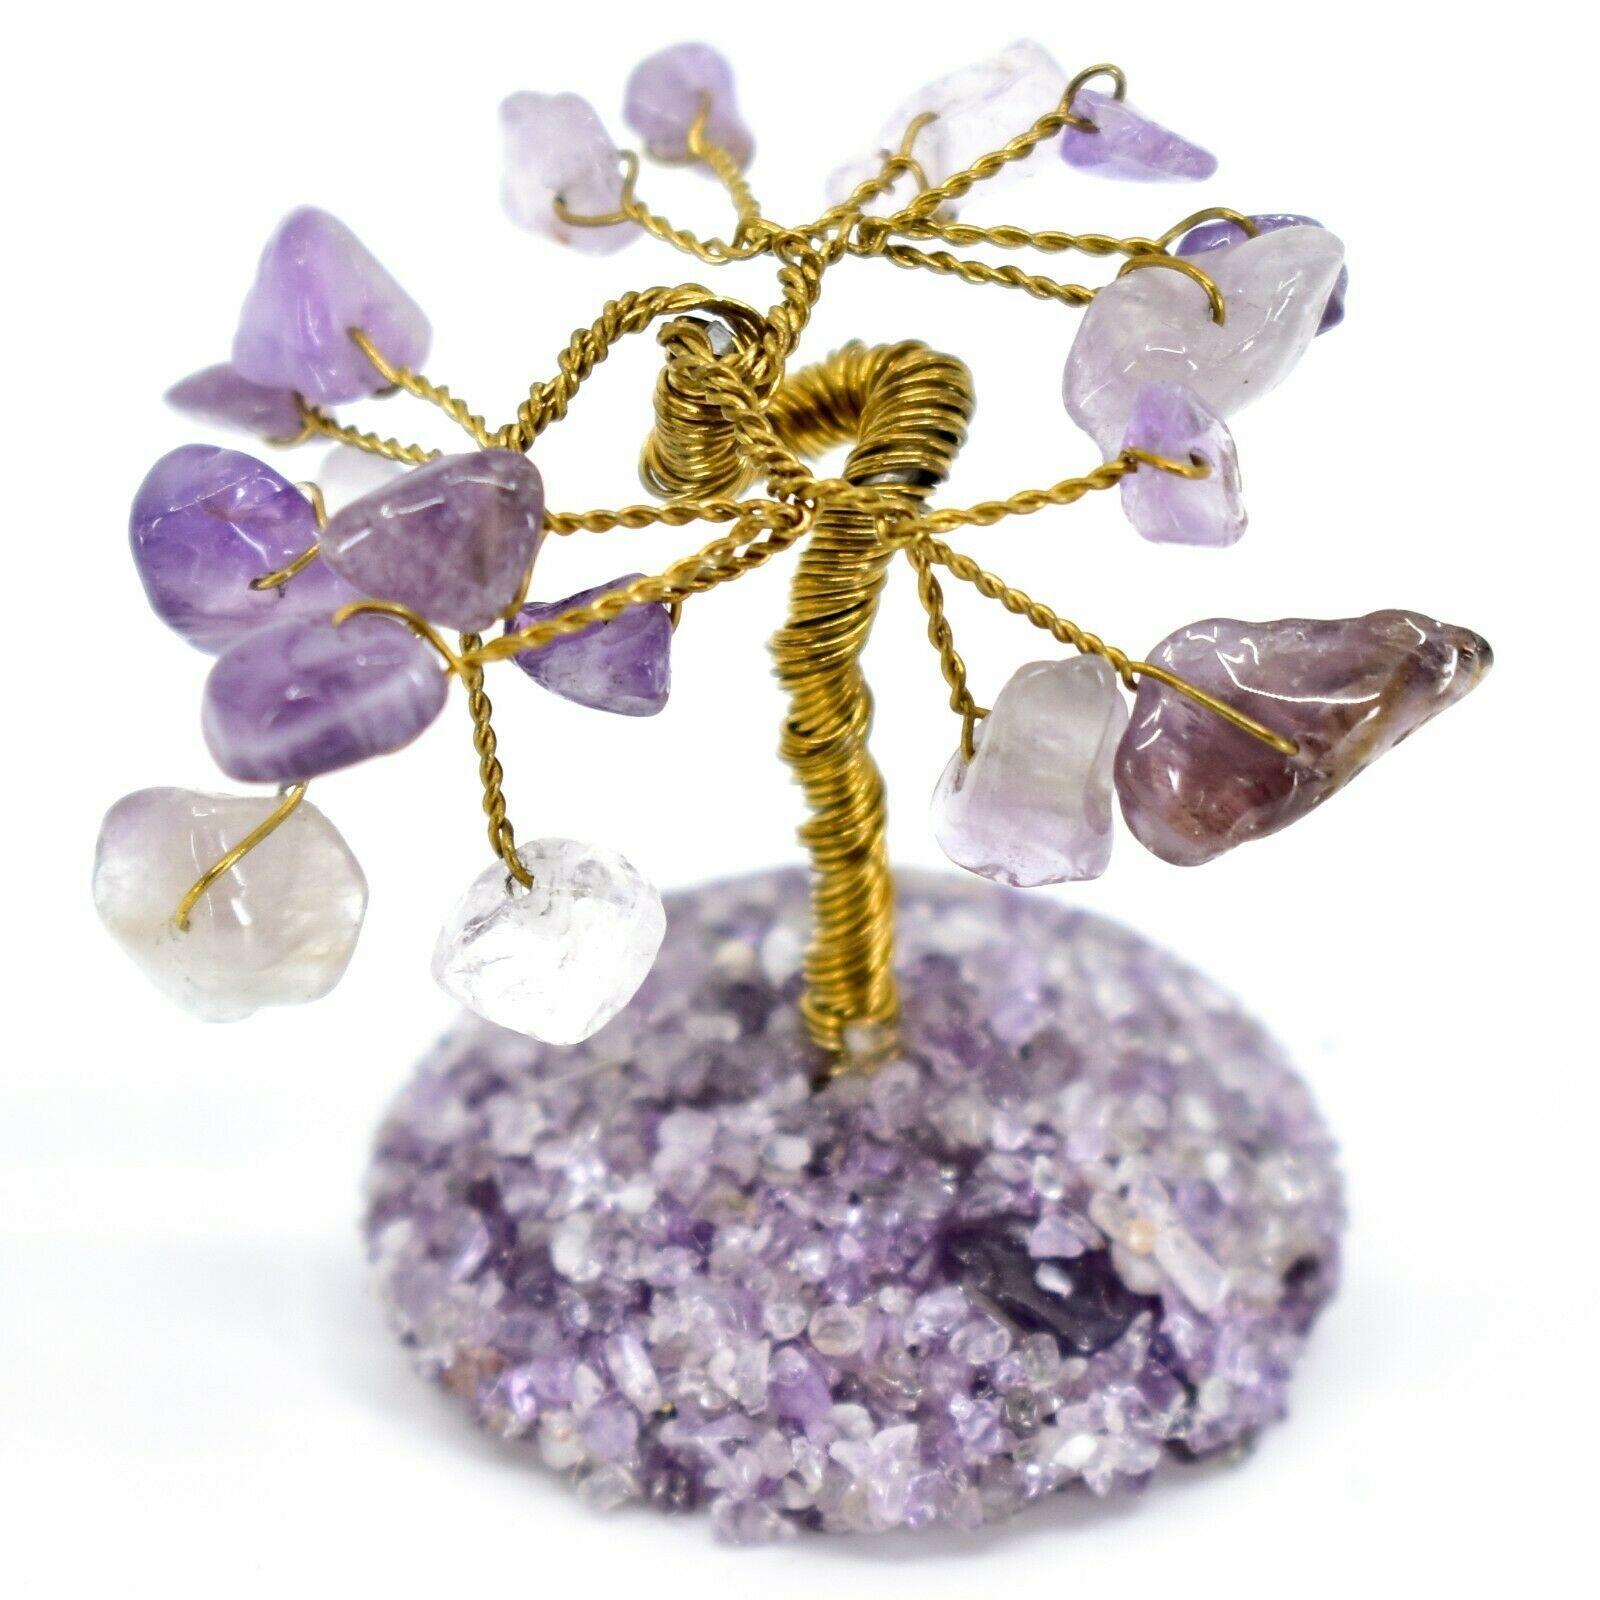 Polished Amethyst Gemstone Miniature Gem Tree Mini Gemtree